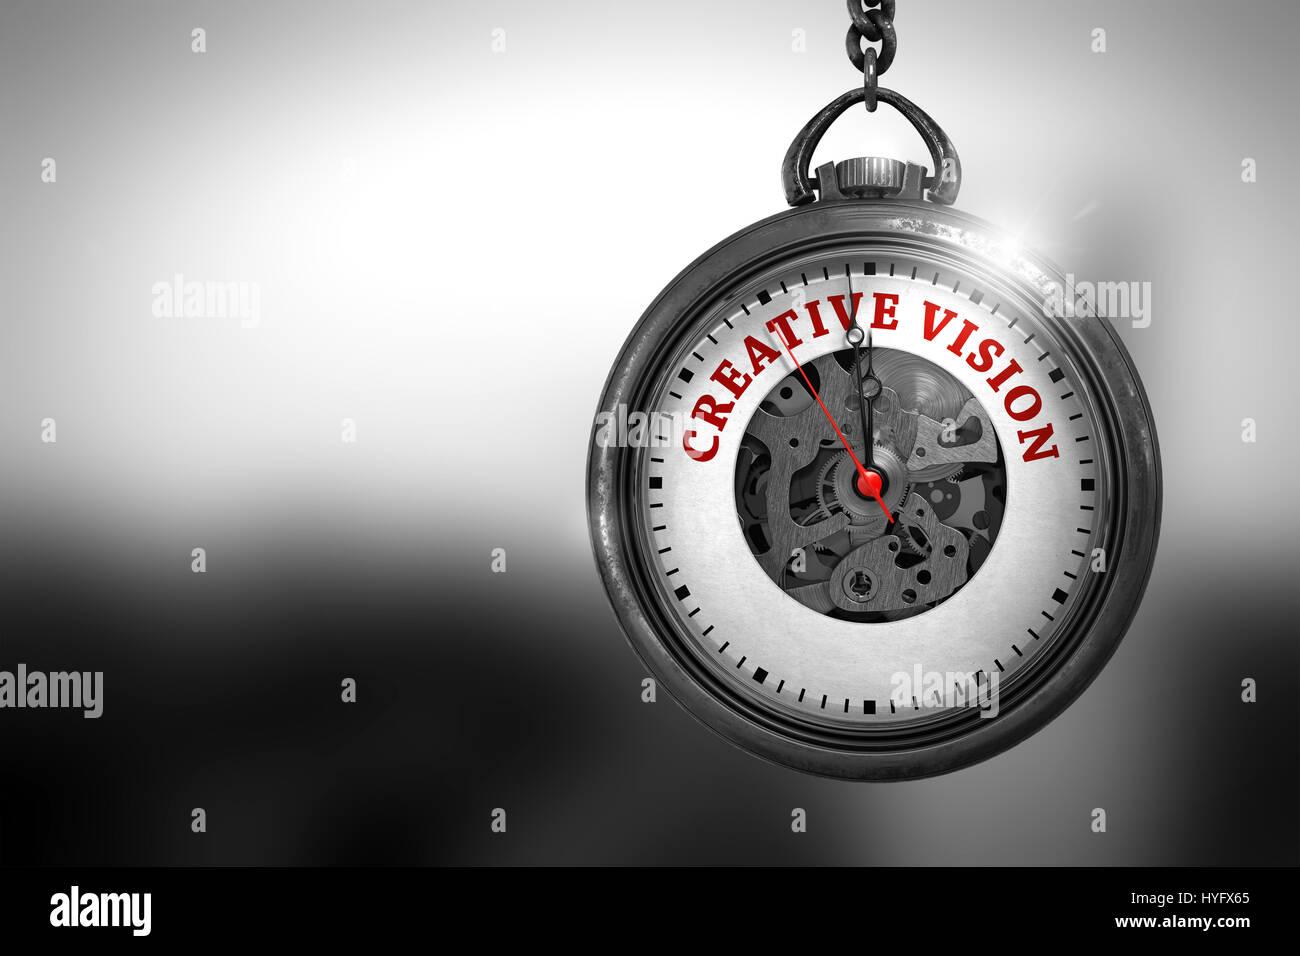 Creative Vision on Pocket Watch. 3D Illustration. - Stock Image